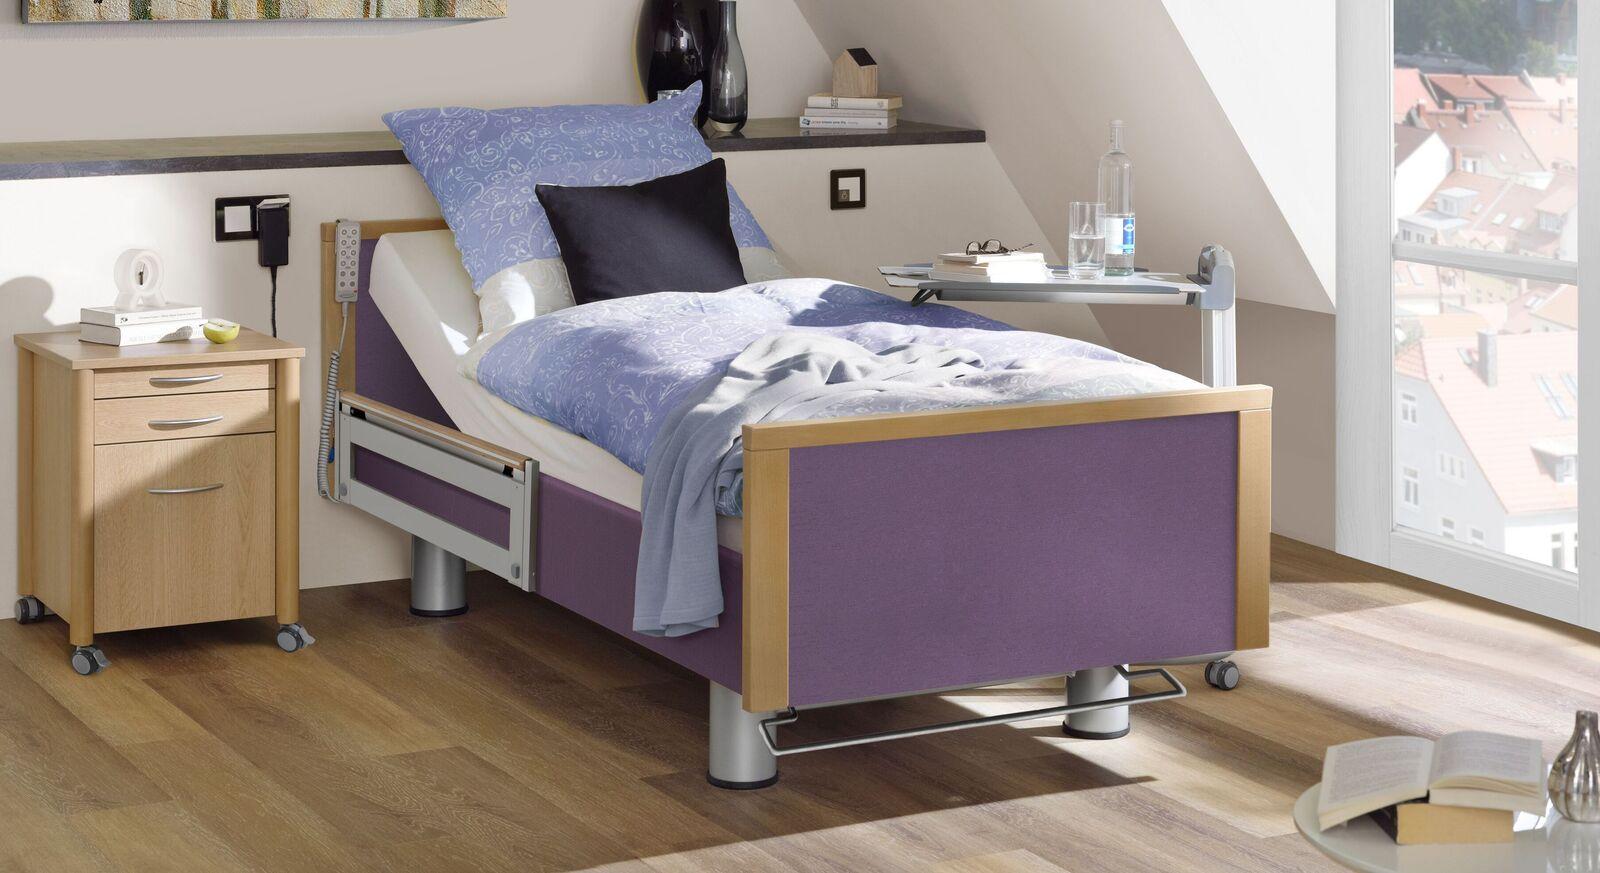 Komfortbett mit Pflegebett-Funktion Sylt mit violettem Stoff